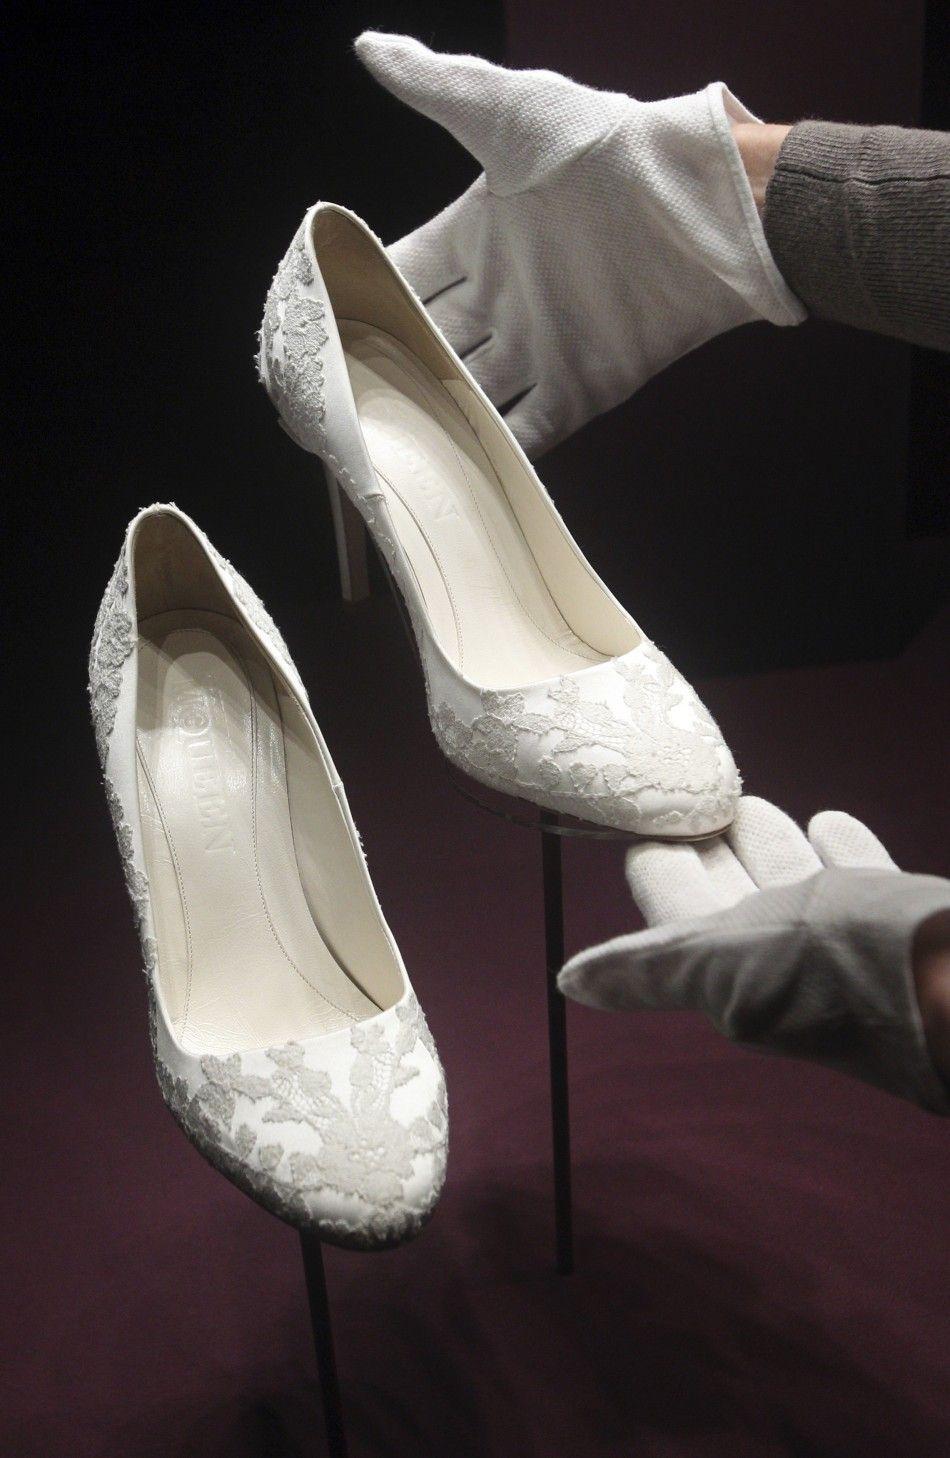 Kate Middleton S Mcqueen Wedding Shoes Kate Middleton Wedding